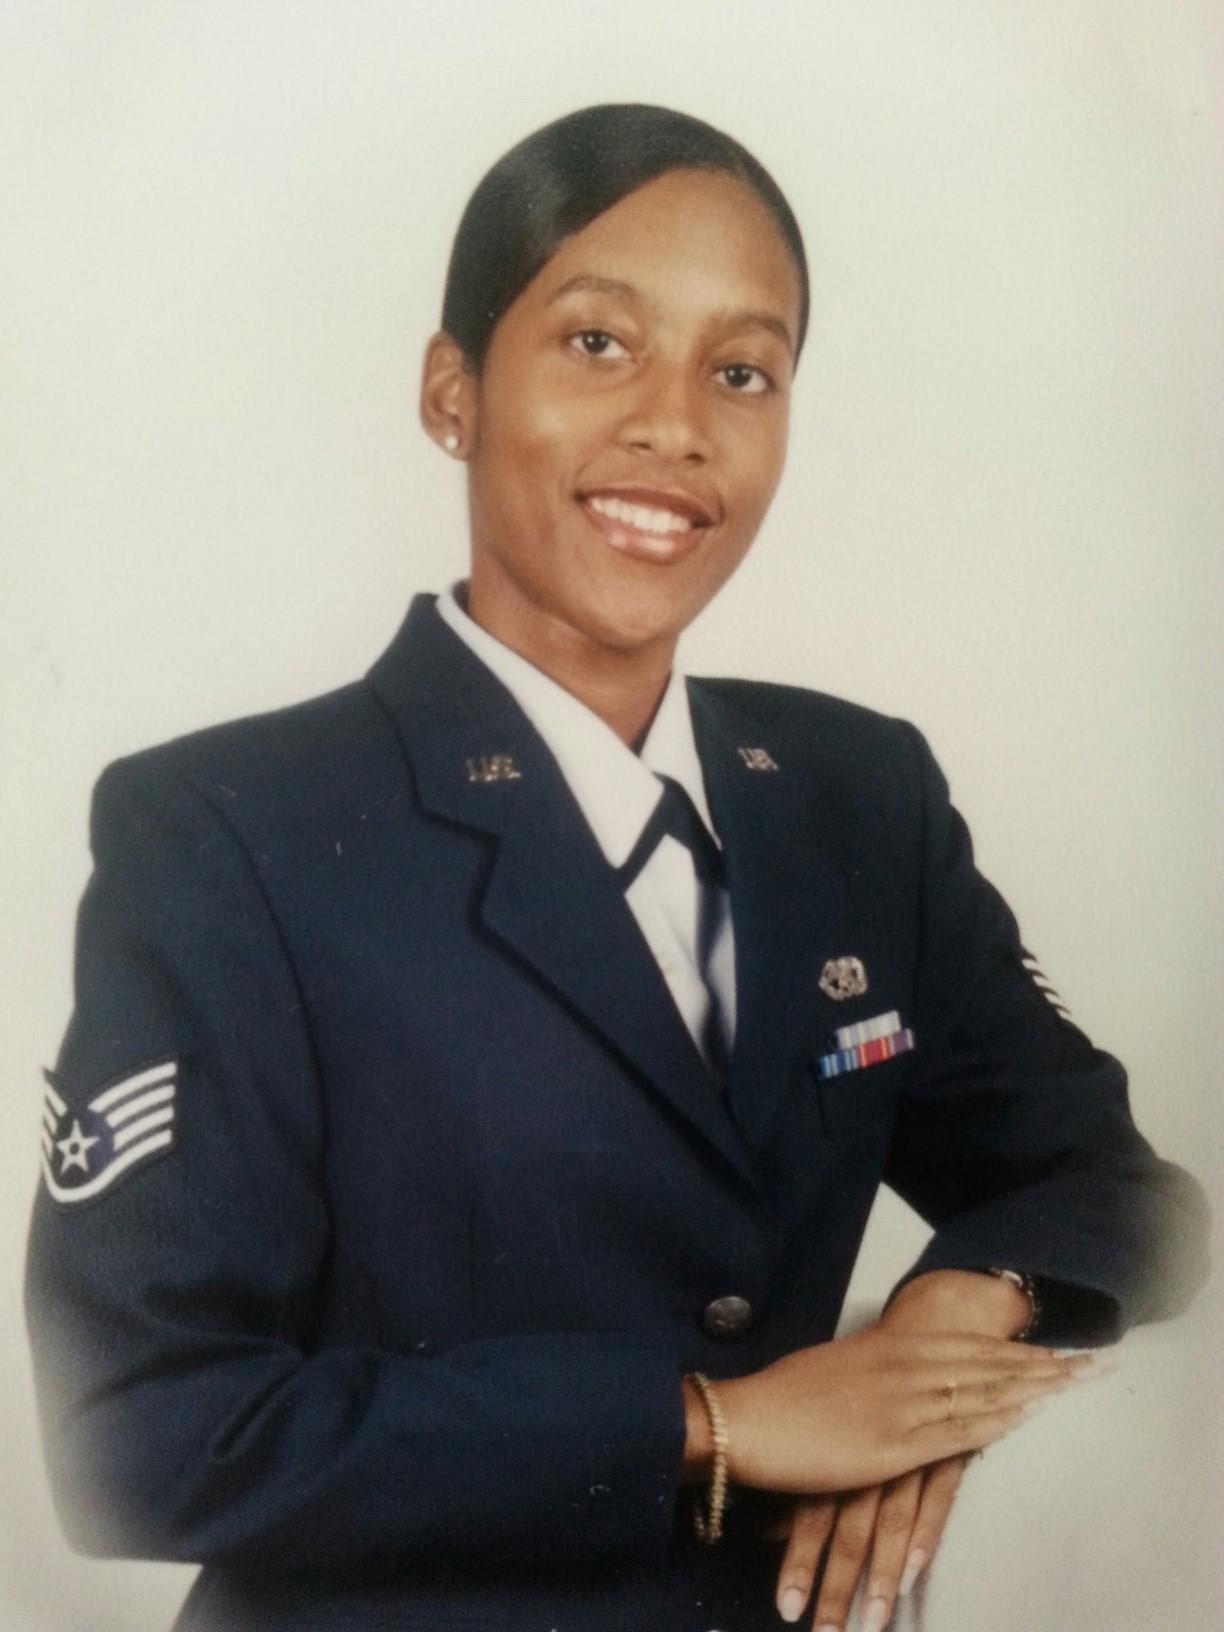 Vanguard vets veterans armed services